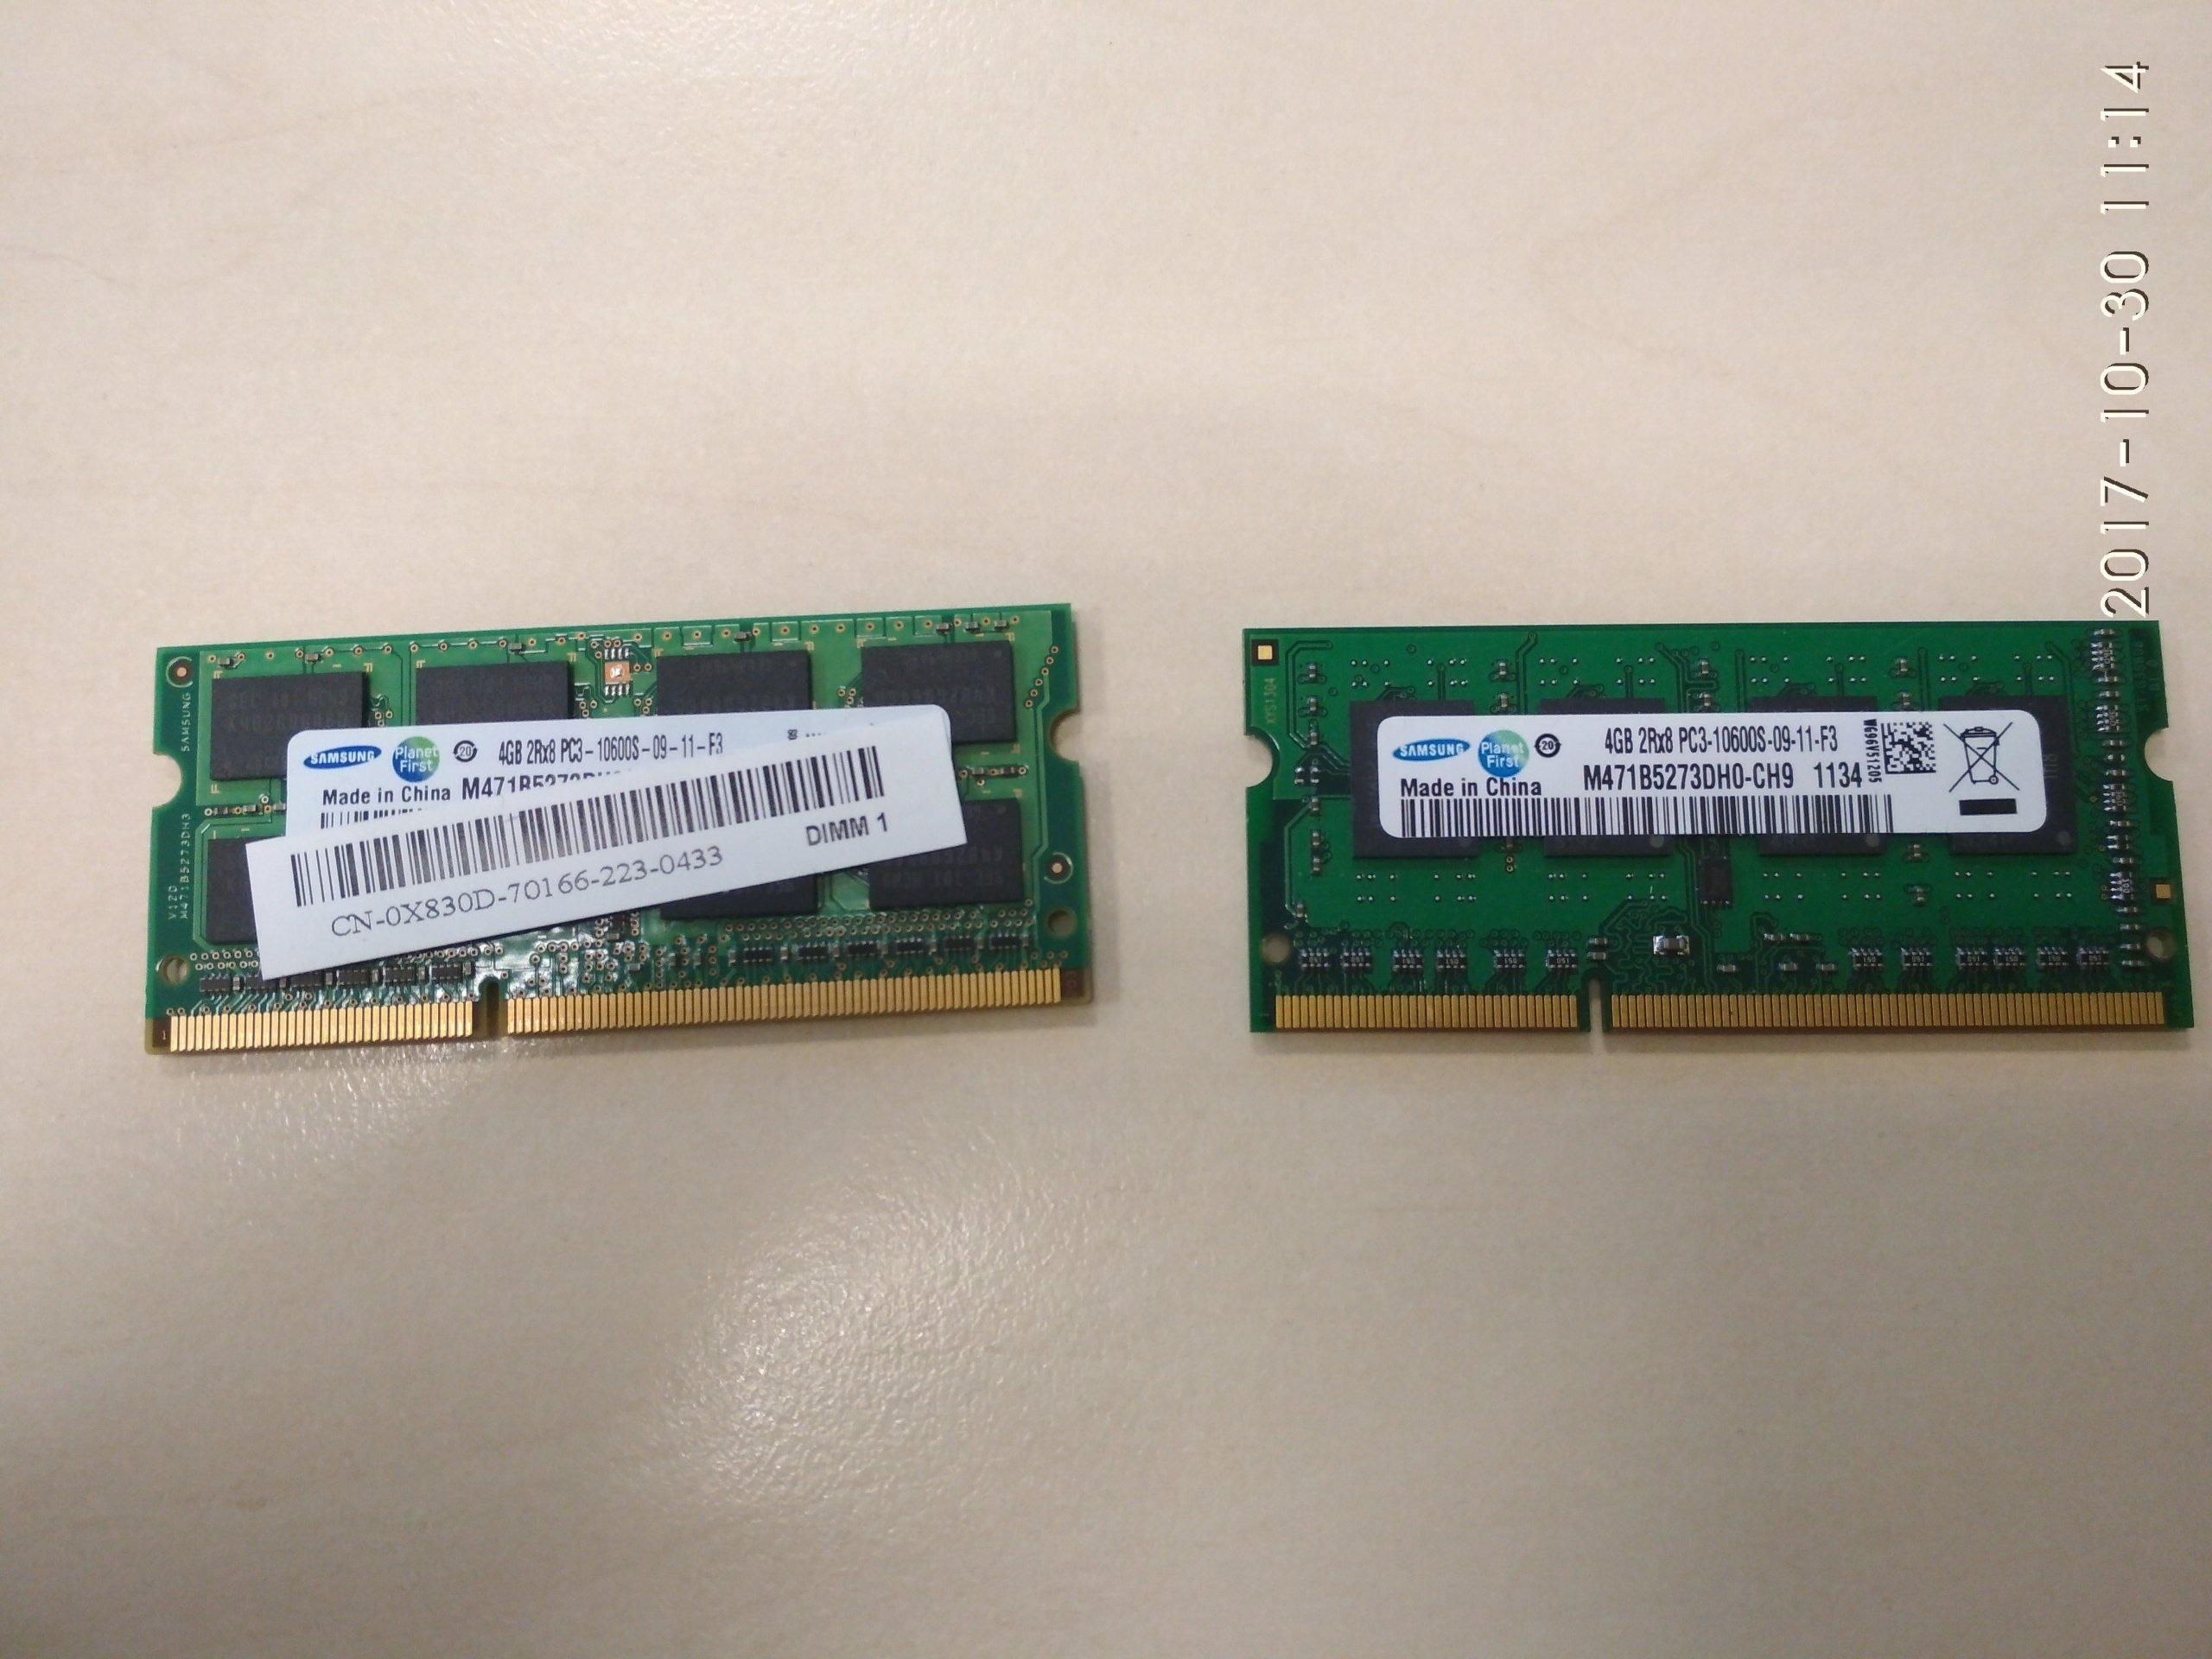 OKAZJA! Pamięć DDR3 Samsung 4GB SODIMM 1333 mhz